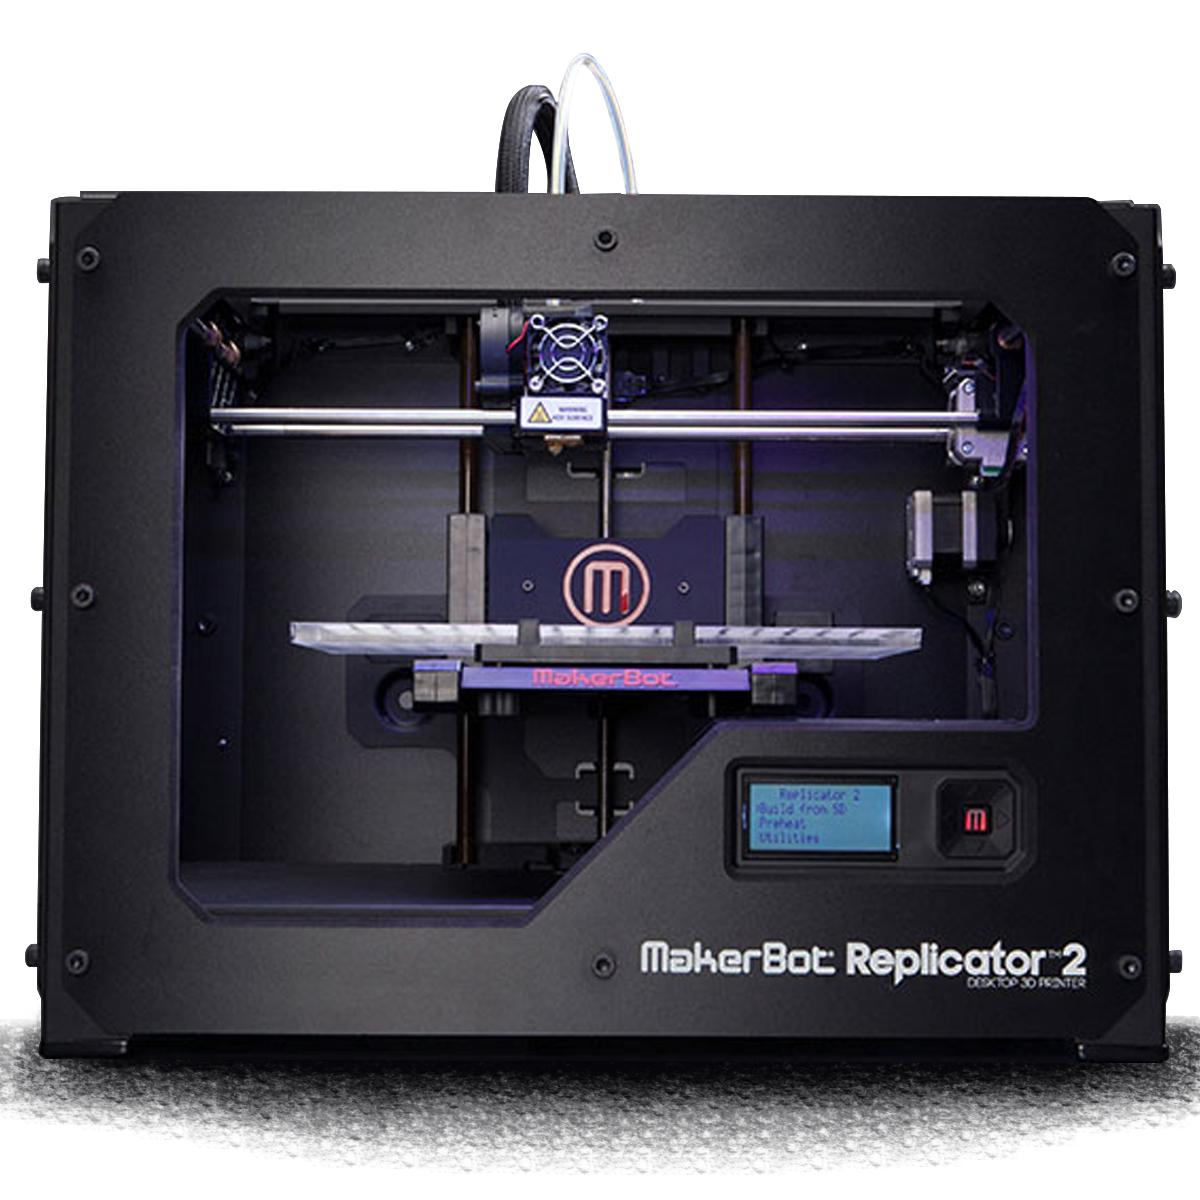 replicator 2 pack acheter makerbot replicator 2 imprimante 3d machines 3d. Black Bedroom Furniture Sets. Home Design Ideas